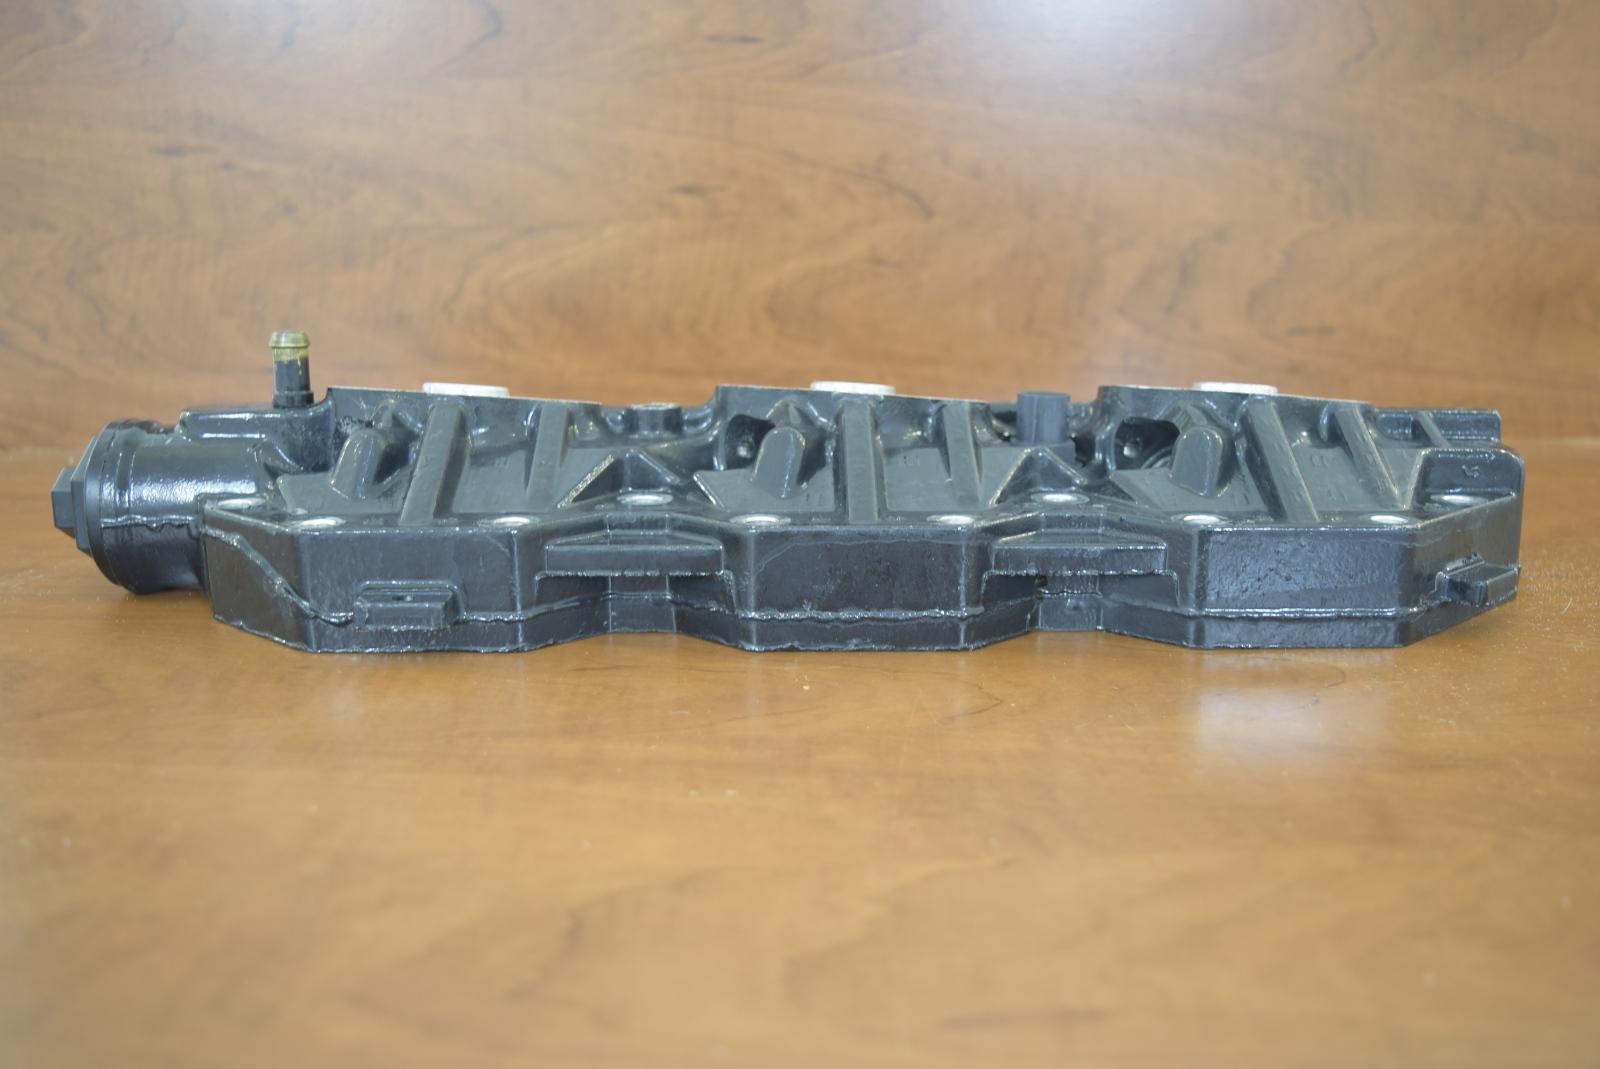 1999 Evinrude 225 Hp Ficht Power Head Ebay - Www imagez co